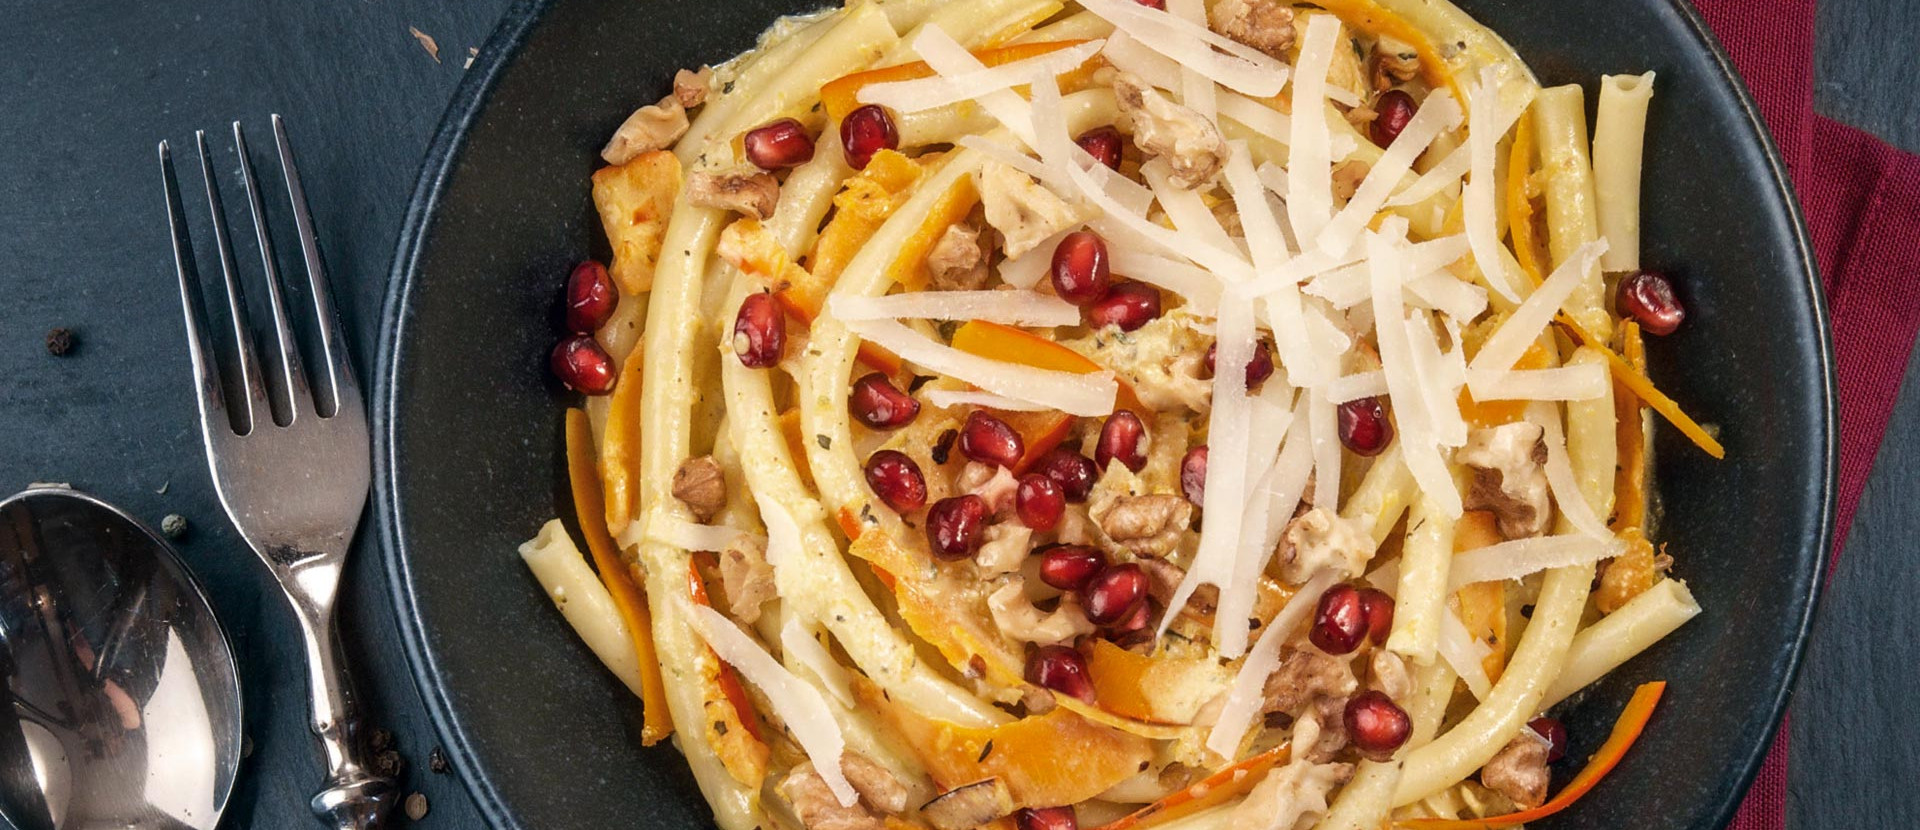 Pasta mit Kürbis,Walnüssen & Granatapfel